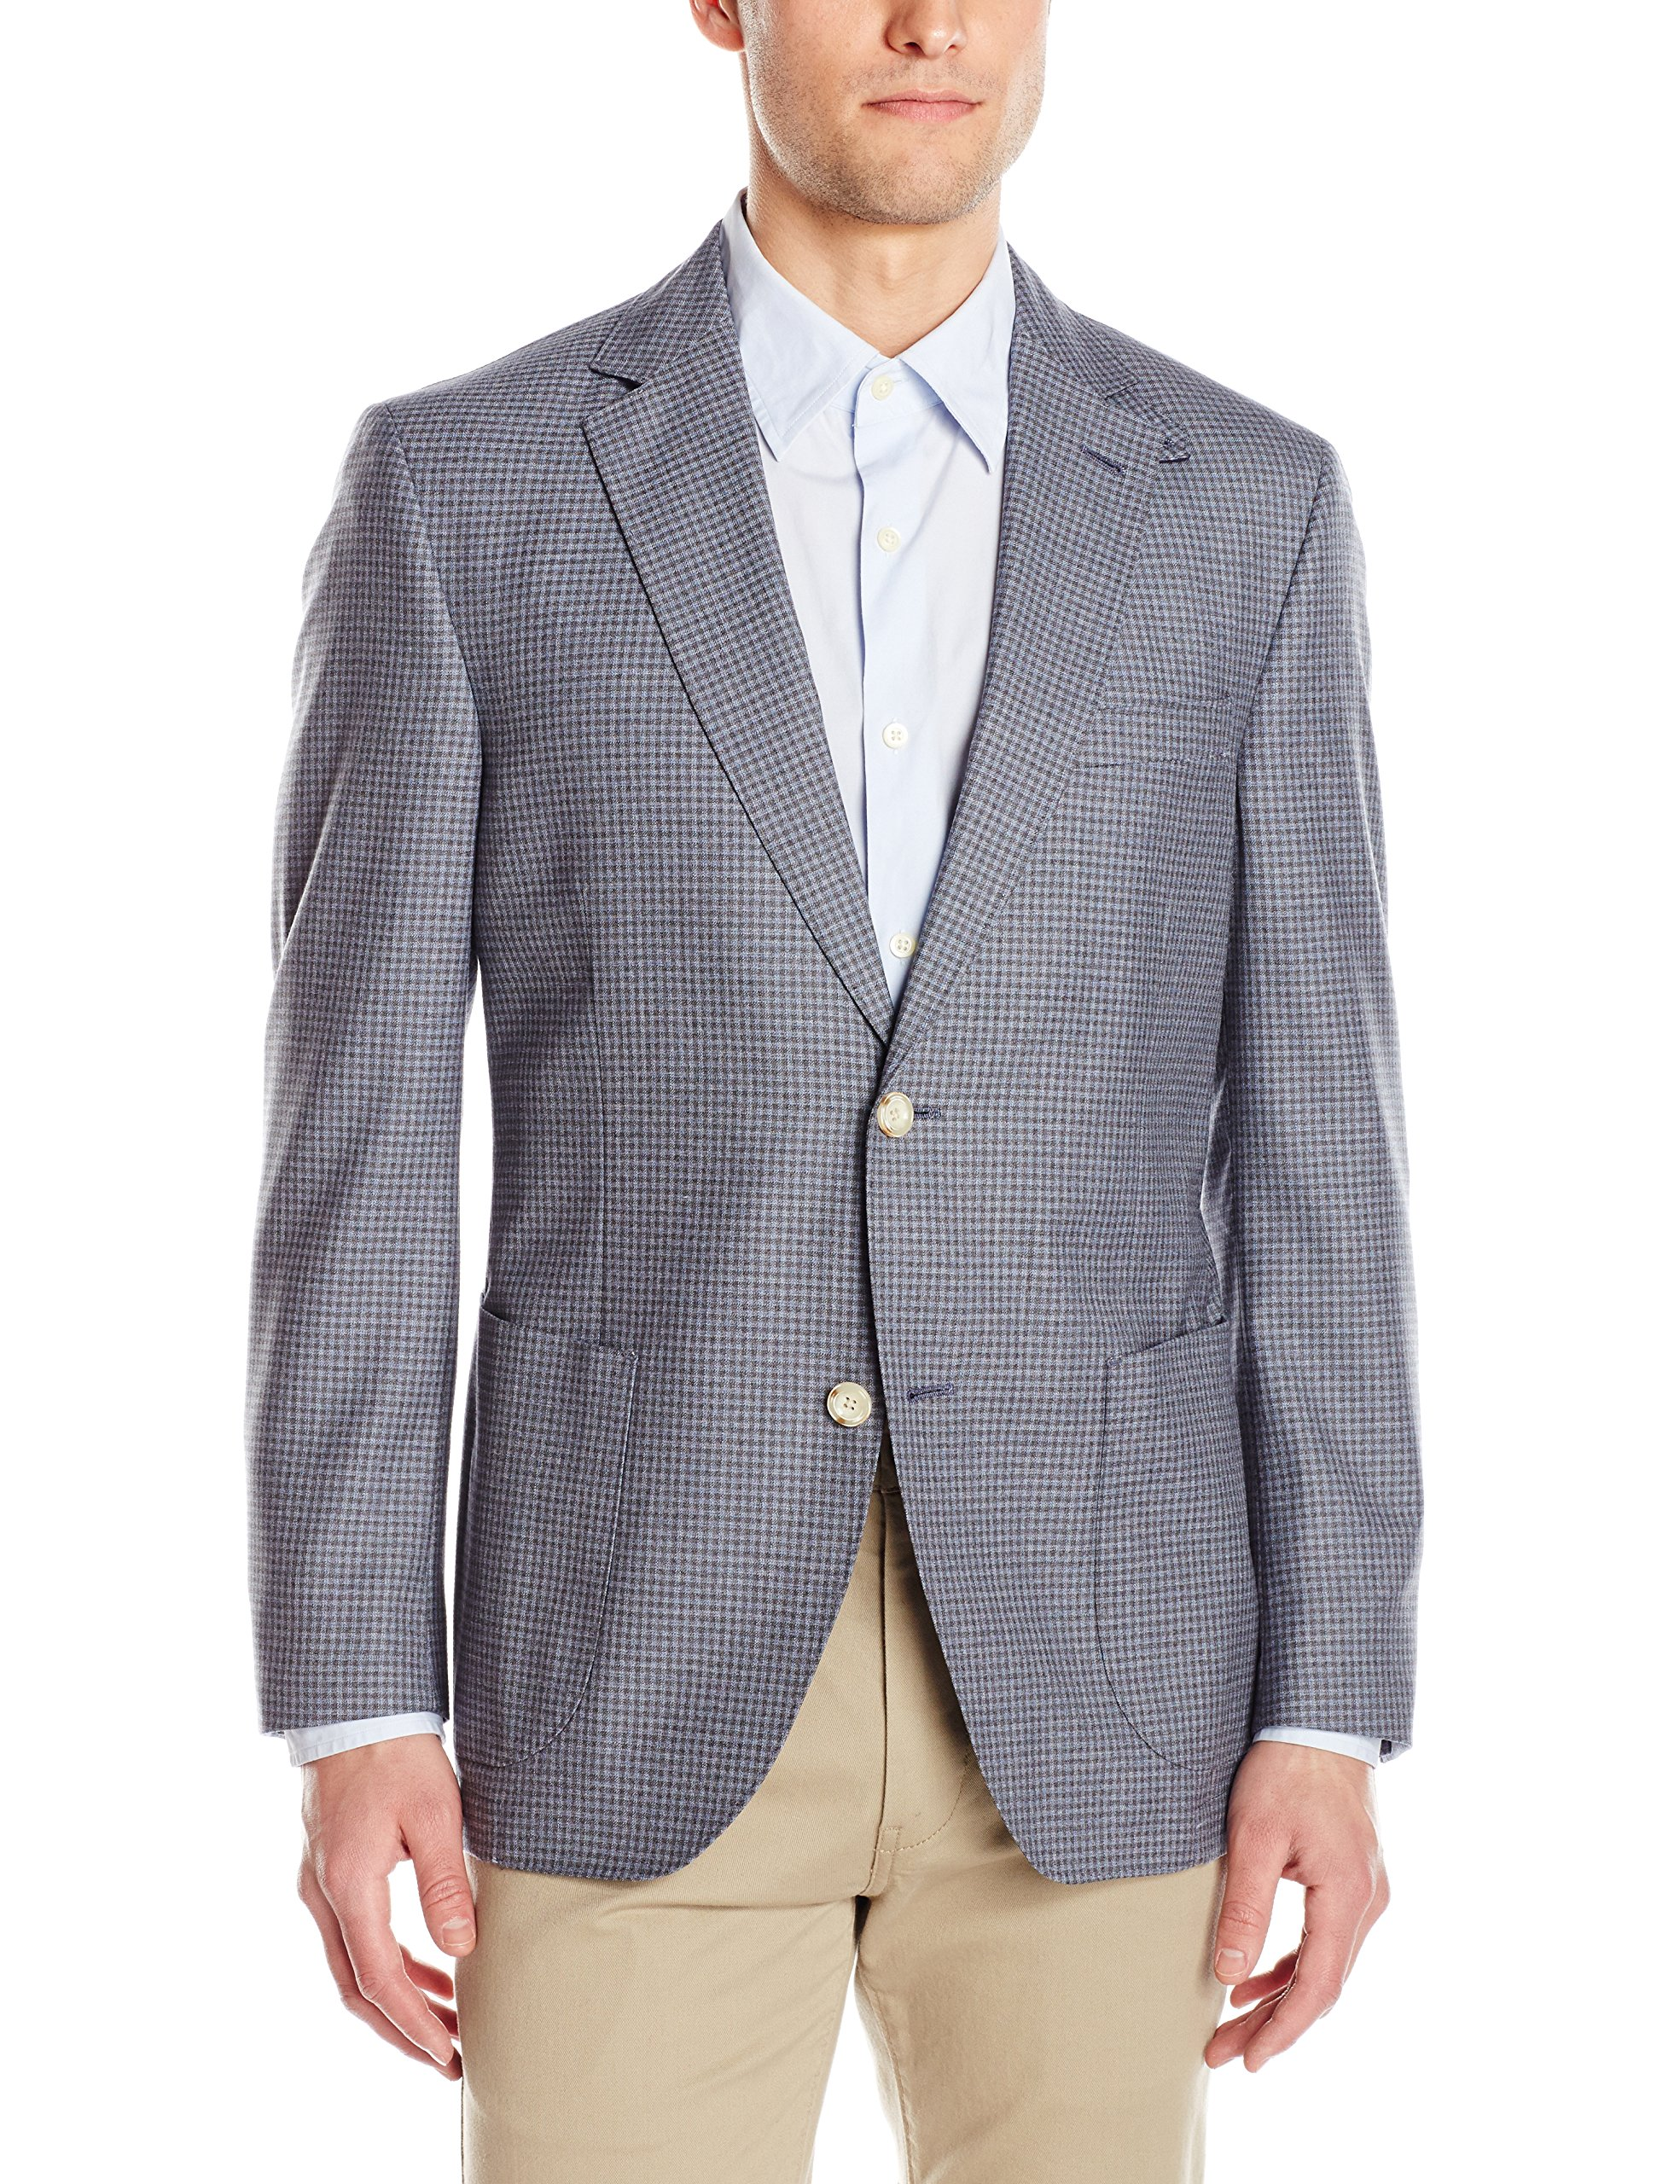 Kroon Men's Bono 2 Fancy Silk and Wool Italian Fabric, Grey, 38 Regular